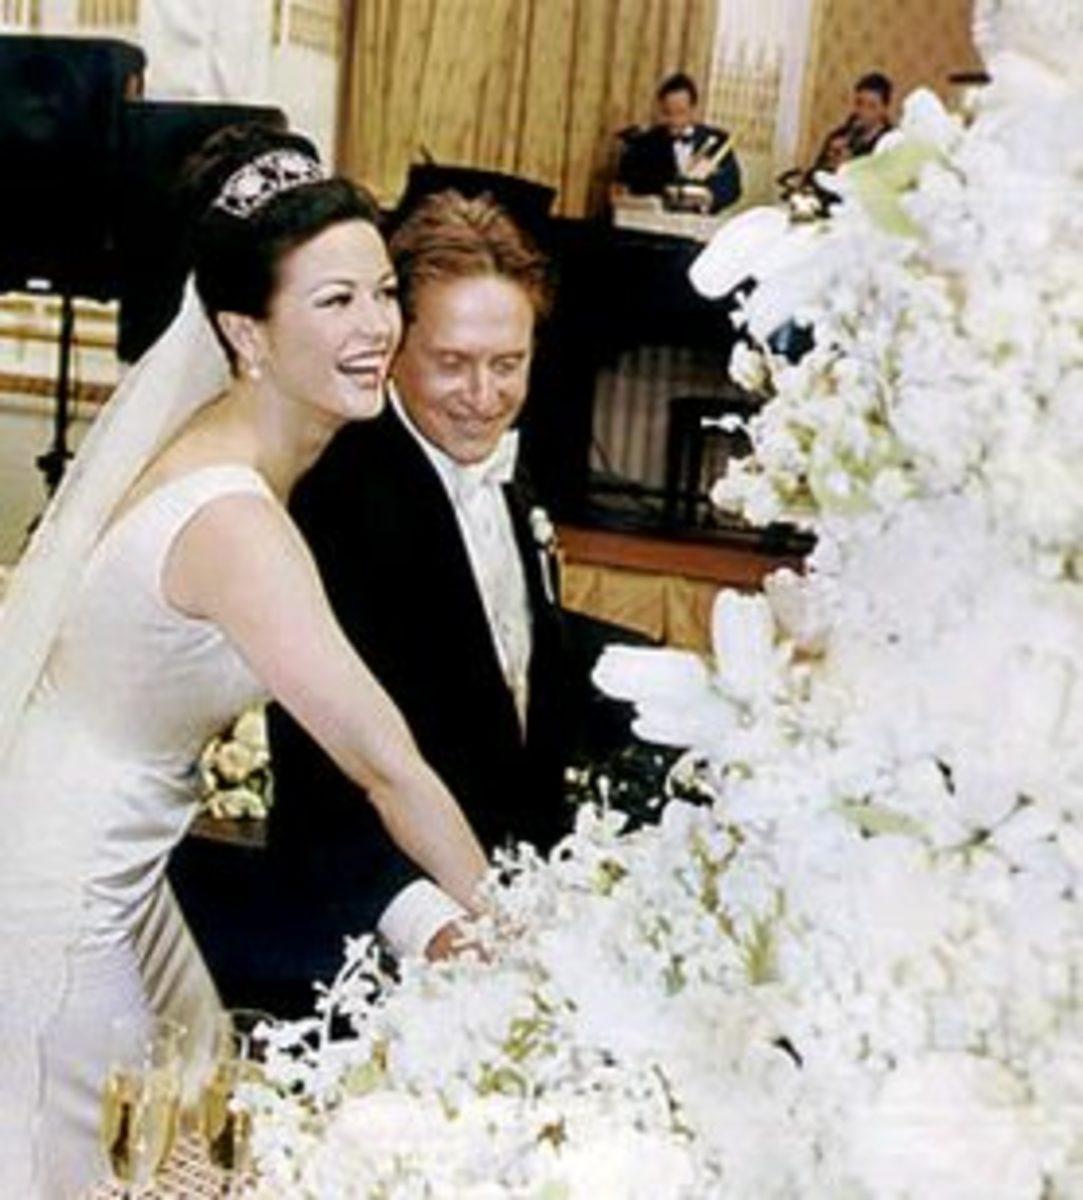 Michael Douglas and Catherine Zeta-Jones Cut Their Sylvia Weinstock Cake